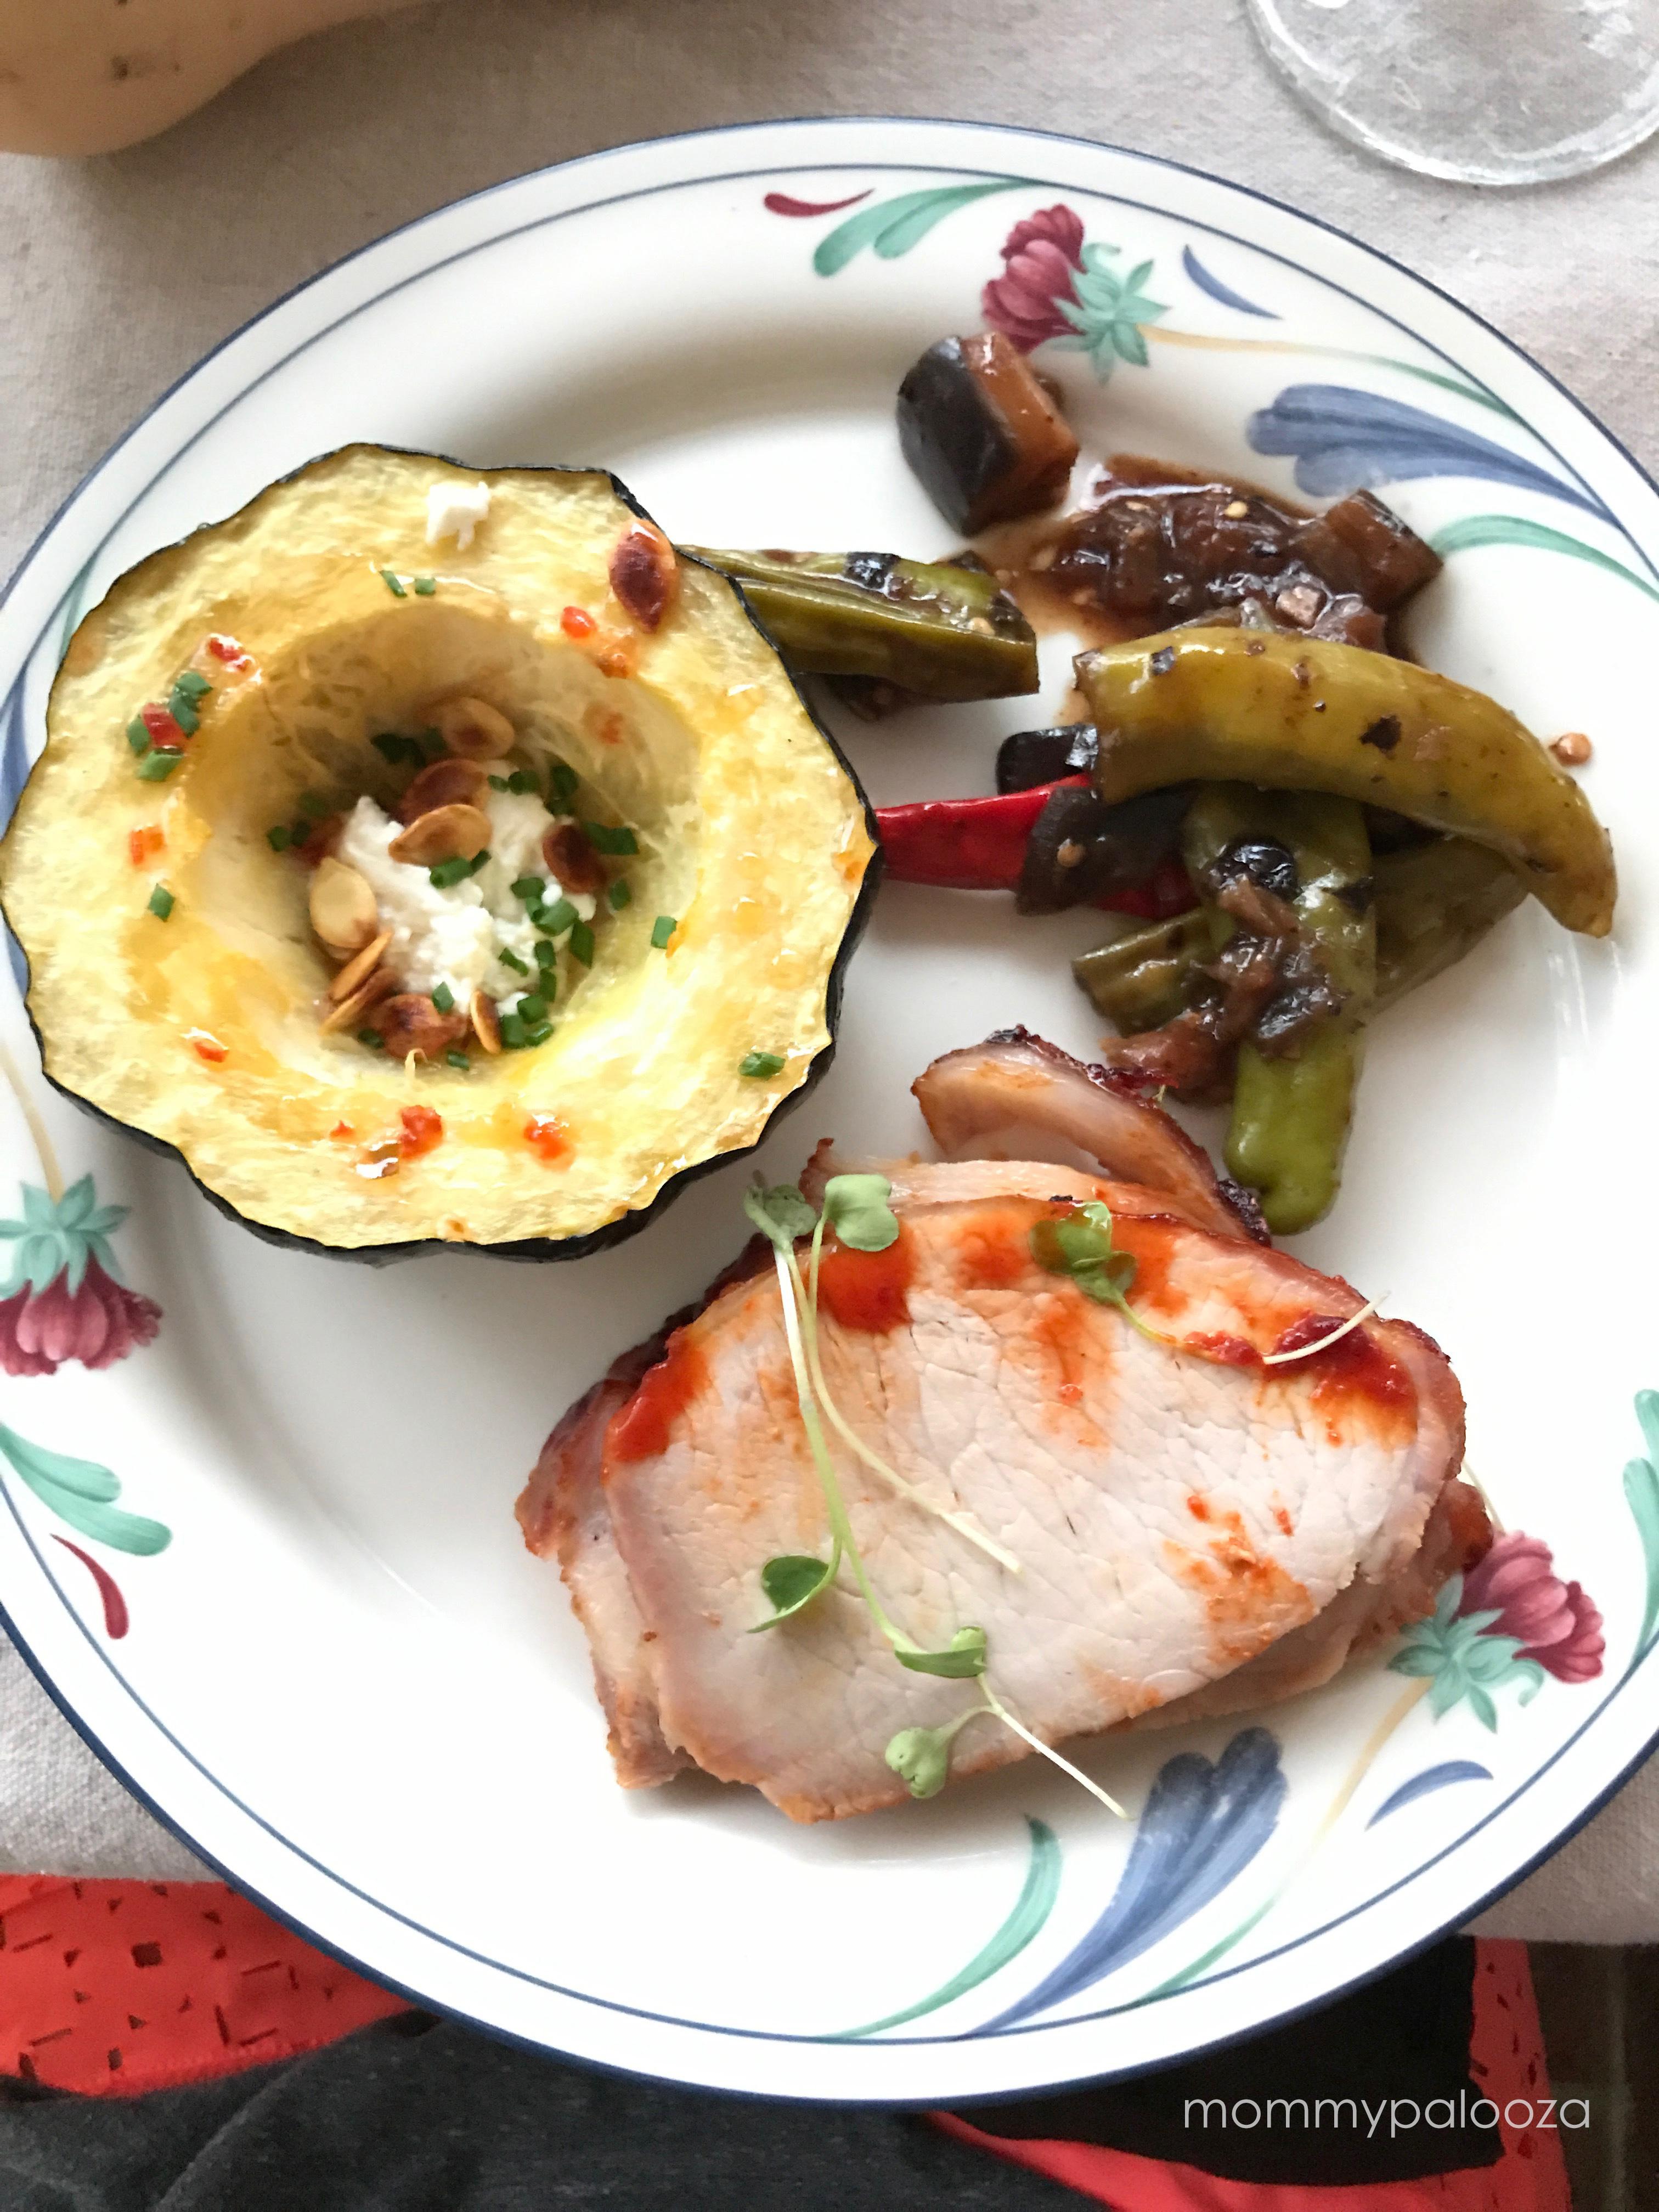 plated dinner serving